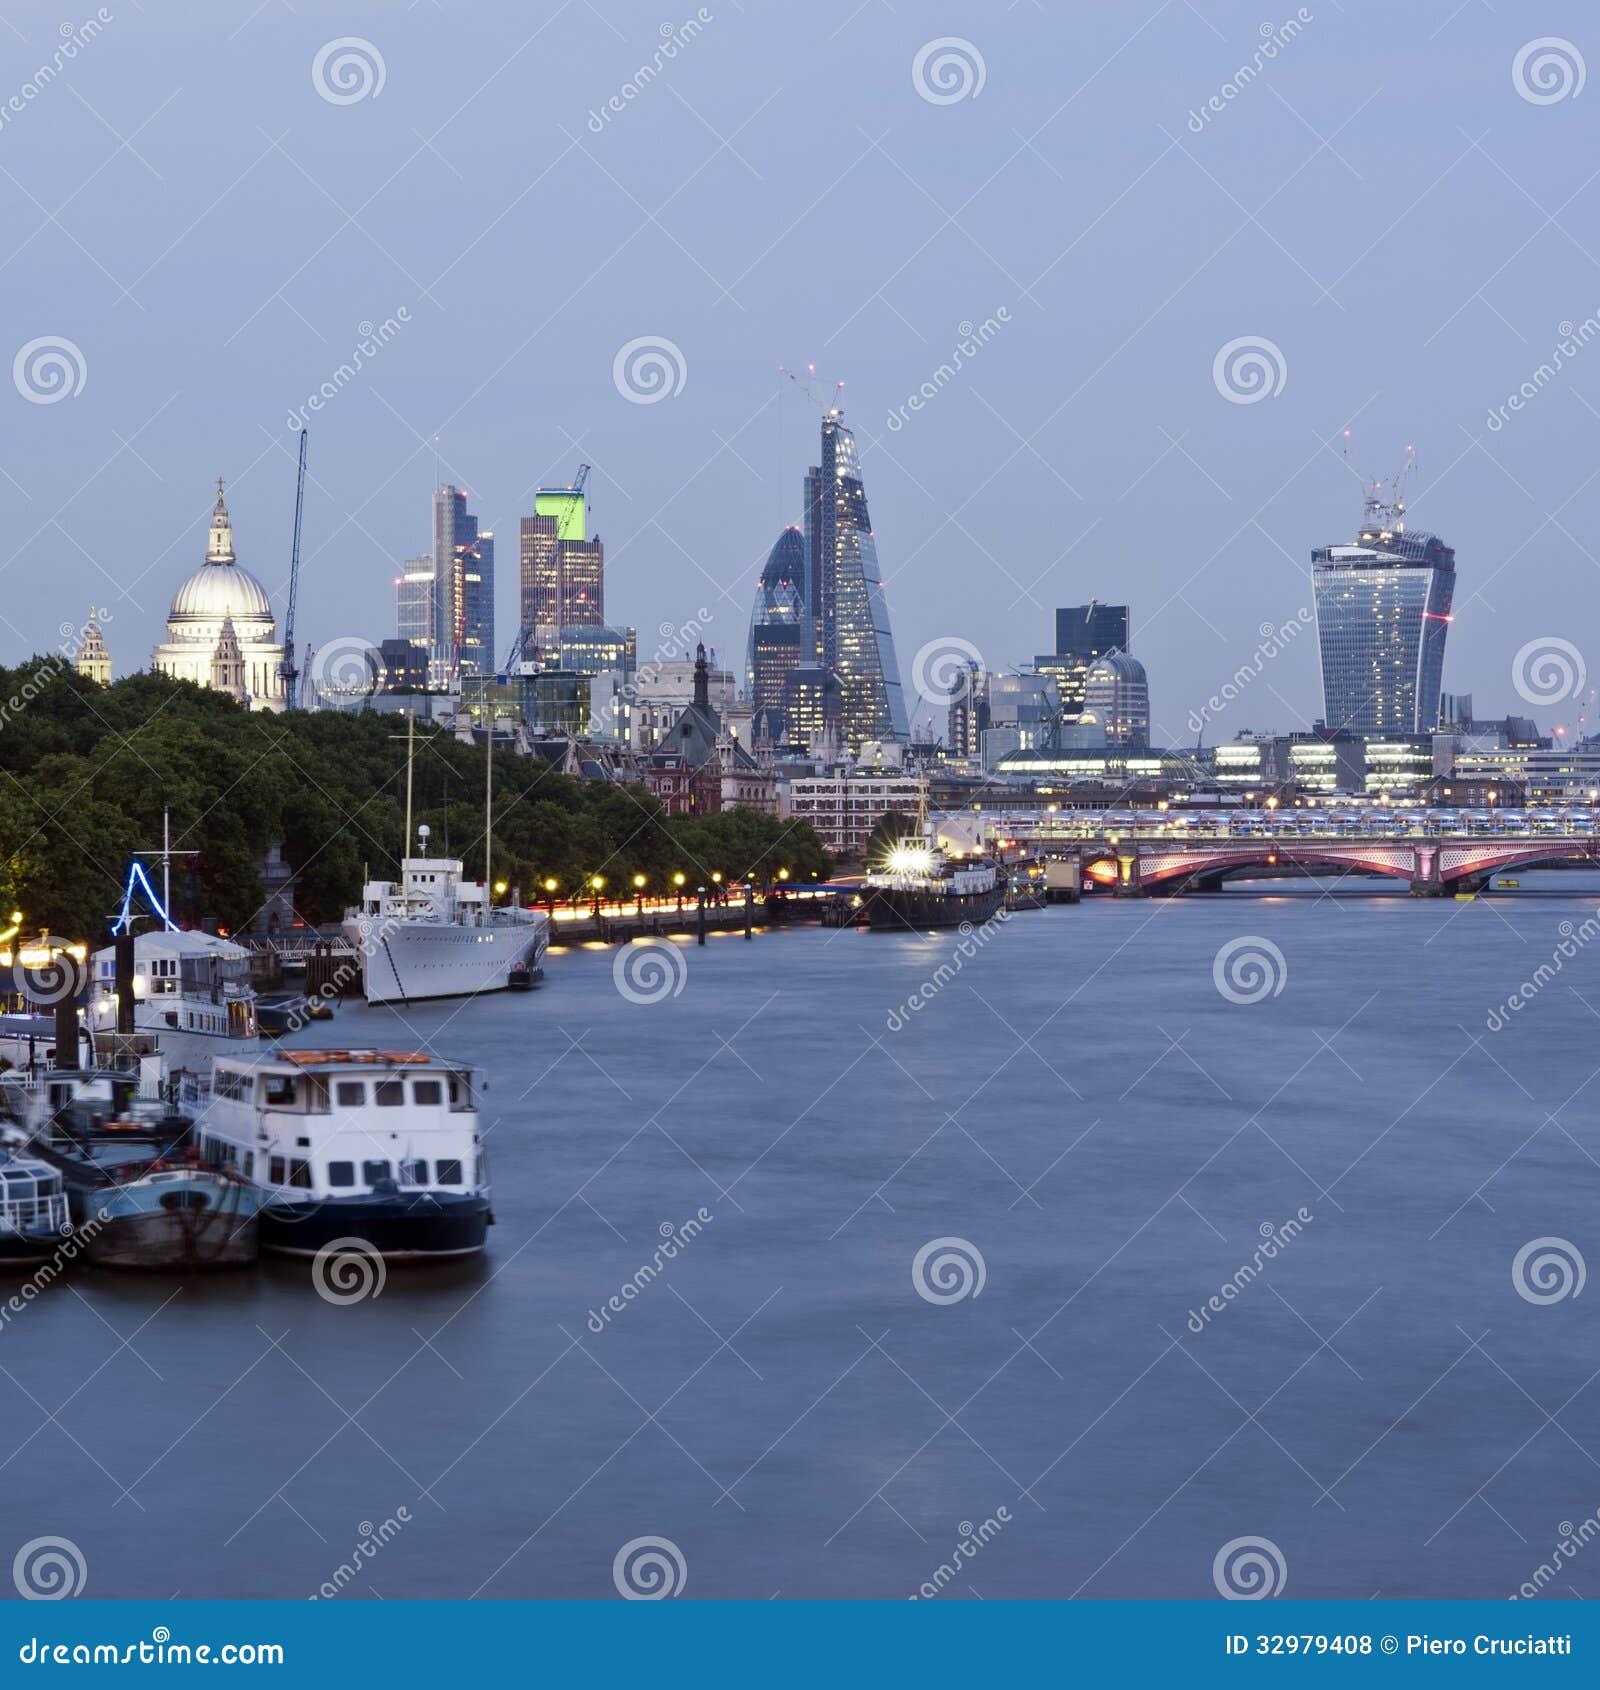 new london skyline 2013 royalty free stock photos